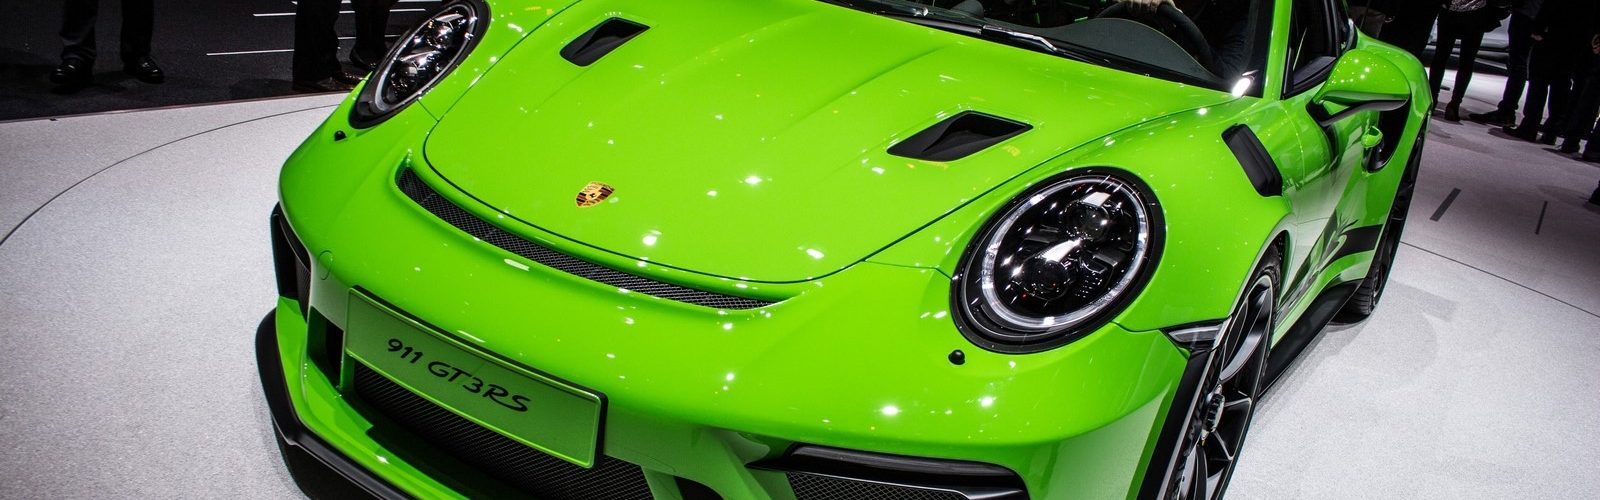 Geneve 2018 Porschei LeNouvelAutomobiliste p1 14